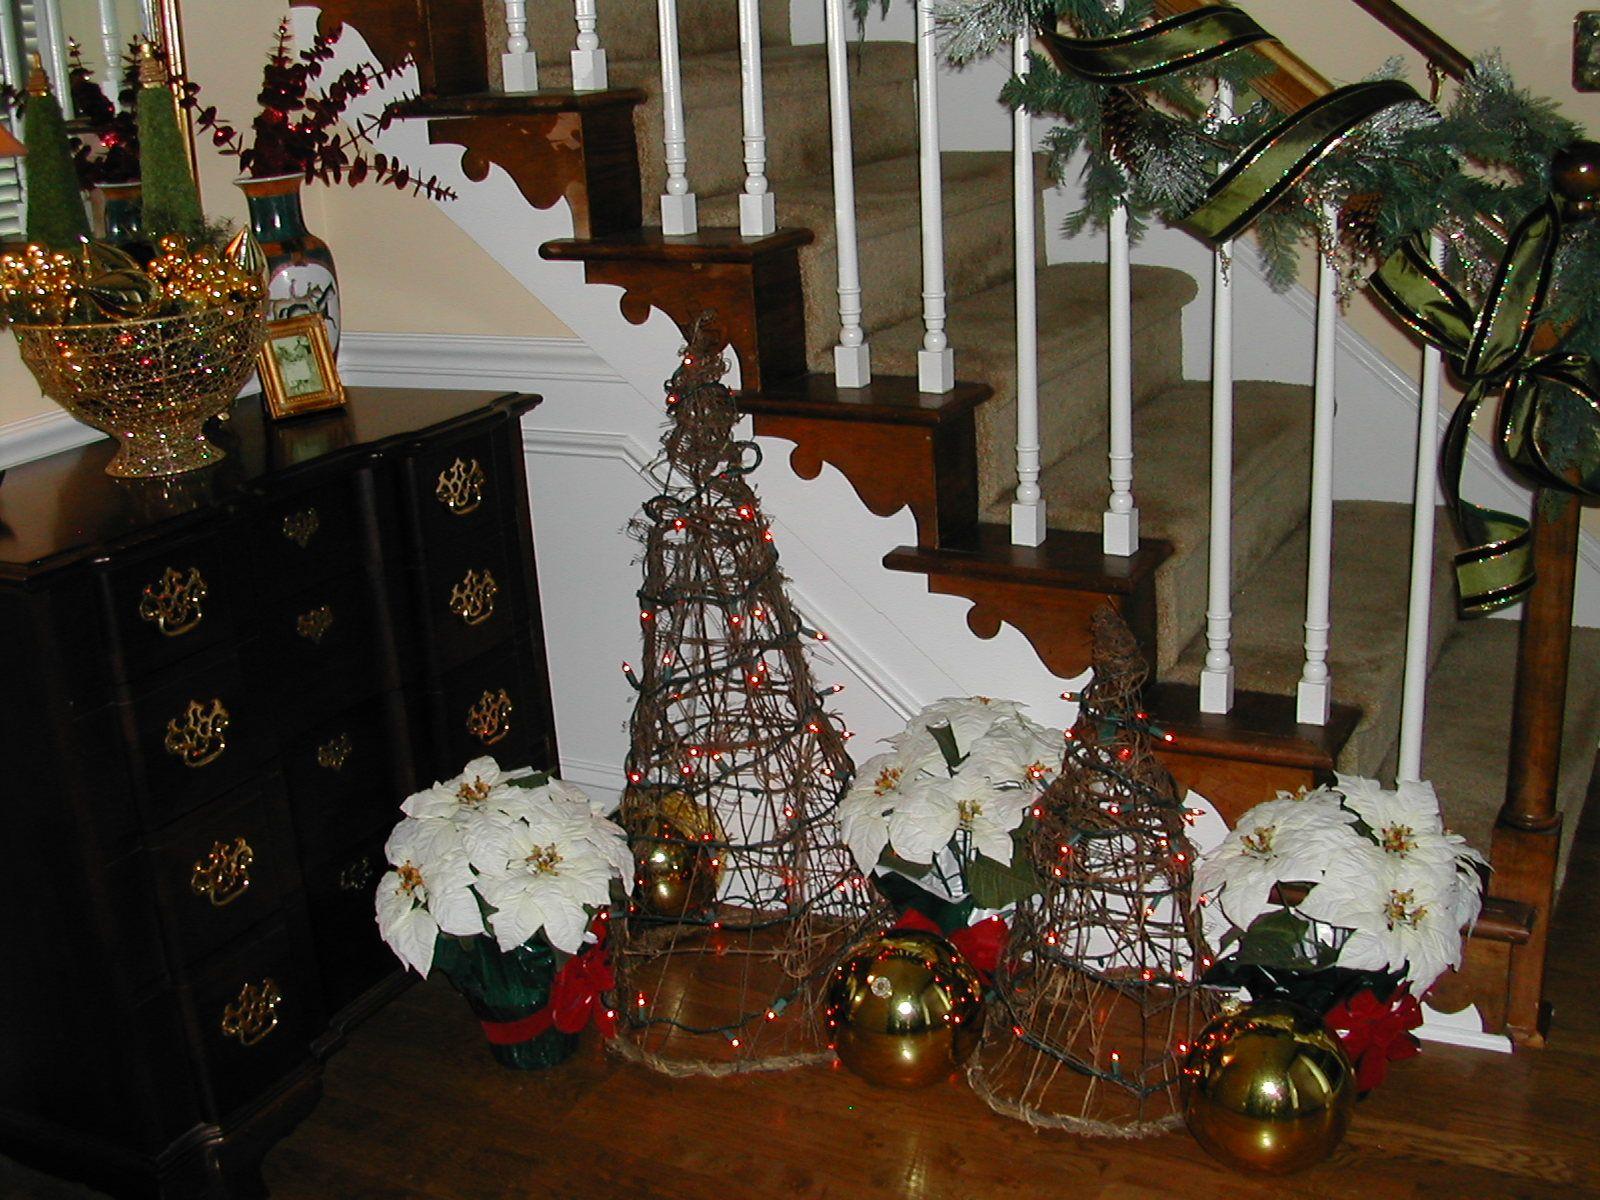 Foyer Christmas Decorating : Christmas foyer decor decorating ideas pinterest